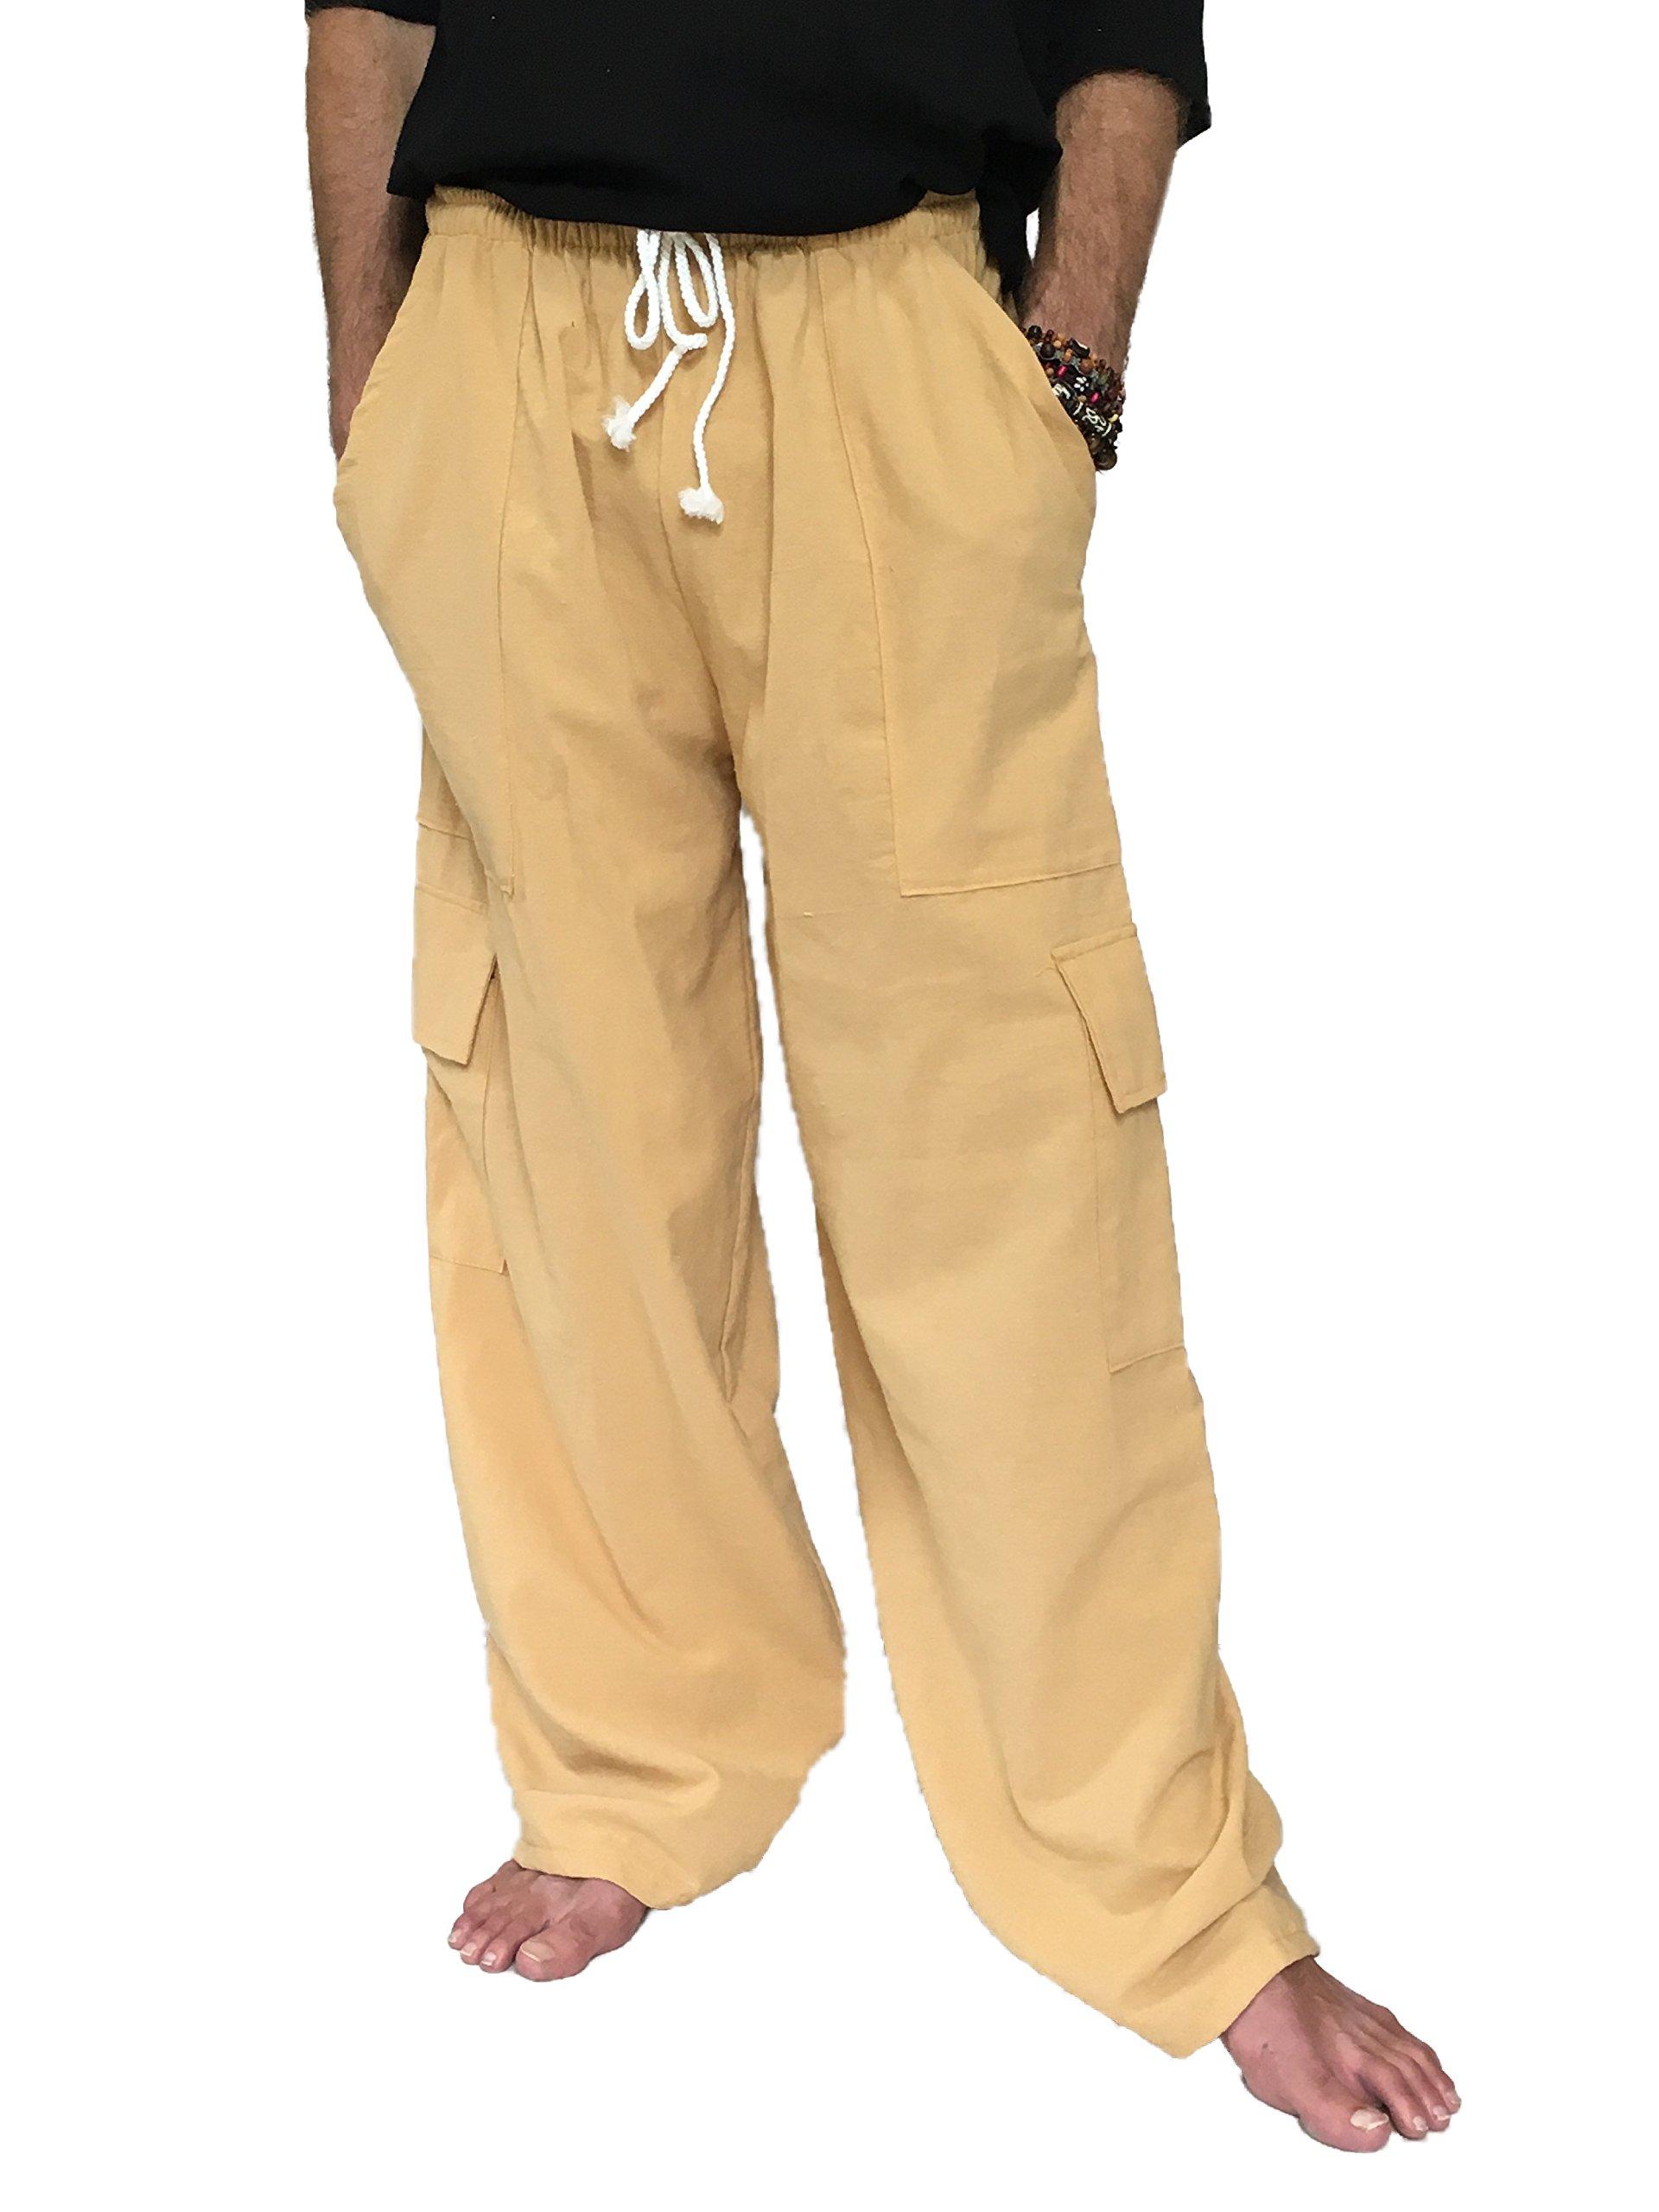 Love Quality Men's 100% Cotton Cargo Pants One Size Baggy Pants Drawstring Elastic Waist (Yellow)